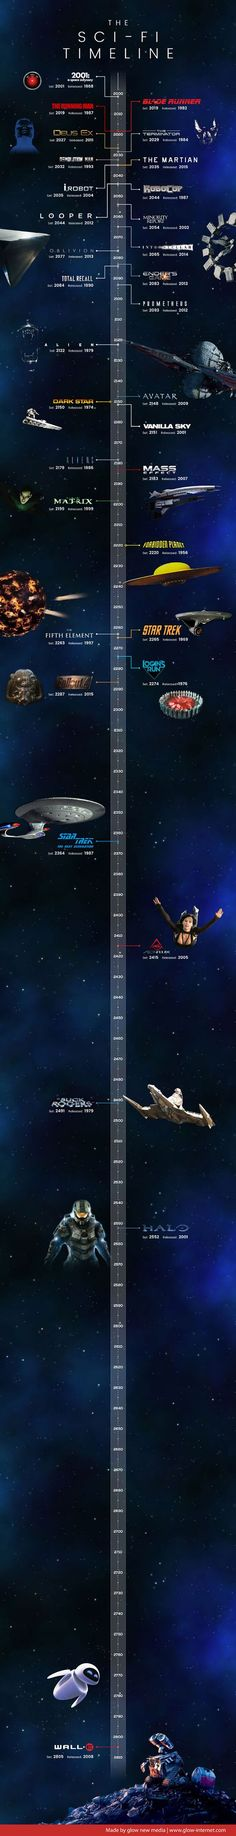 Von im Weltraum bis Wall-E im Jahr Die Sciene-Fiction-Zeitleiste From 2001 Odyssey in space to Wall-E in The science fiction timeline Beau Film, Sci Fi Genre, Arte Alien, Poster Print, Timeline Infographic, Classic Sci Fi, Science Fiction Books, Fiction Movies, See Movie